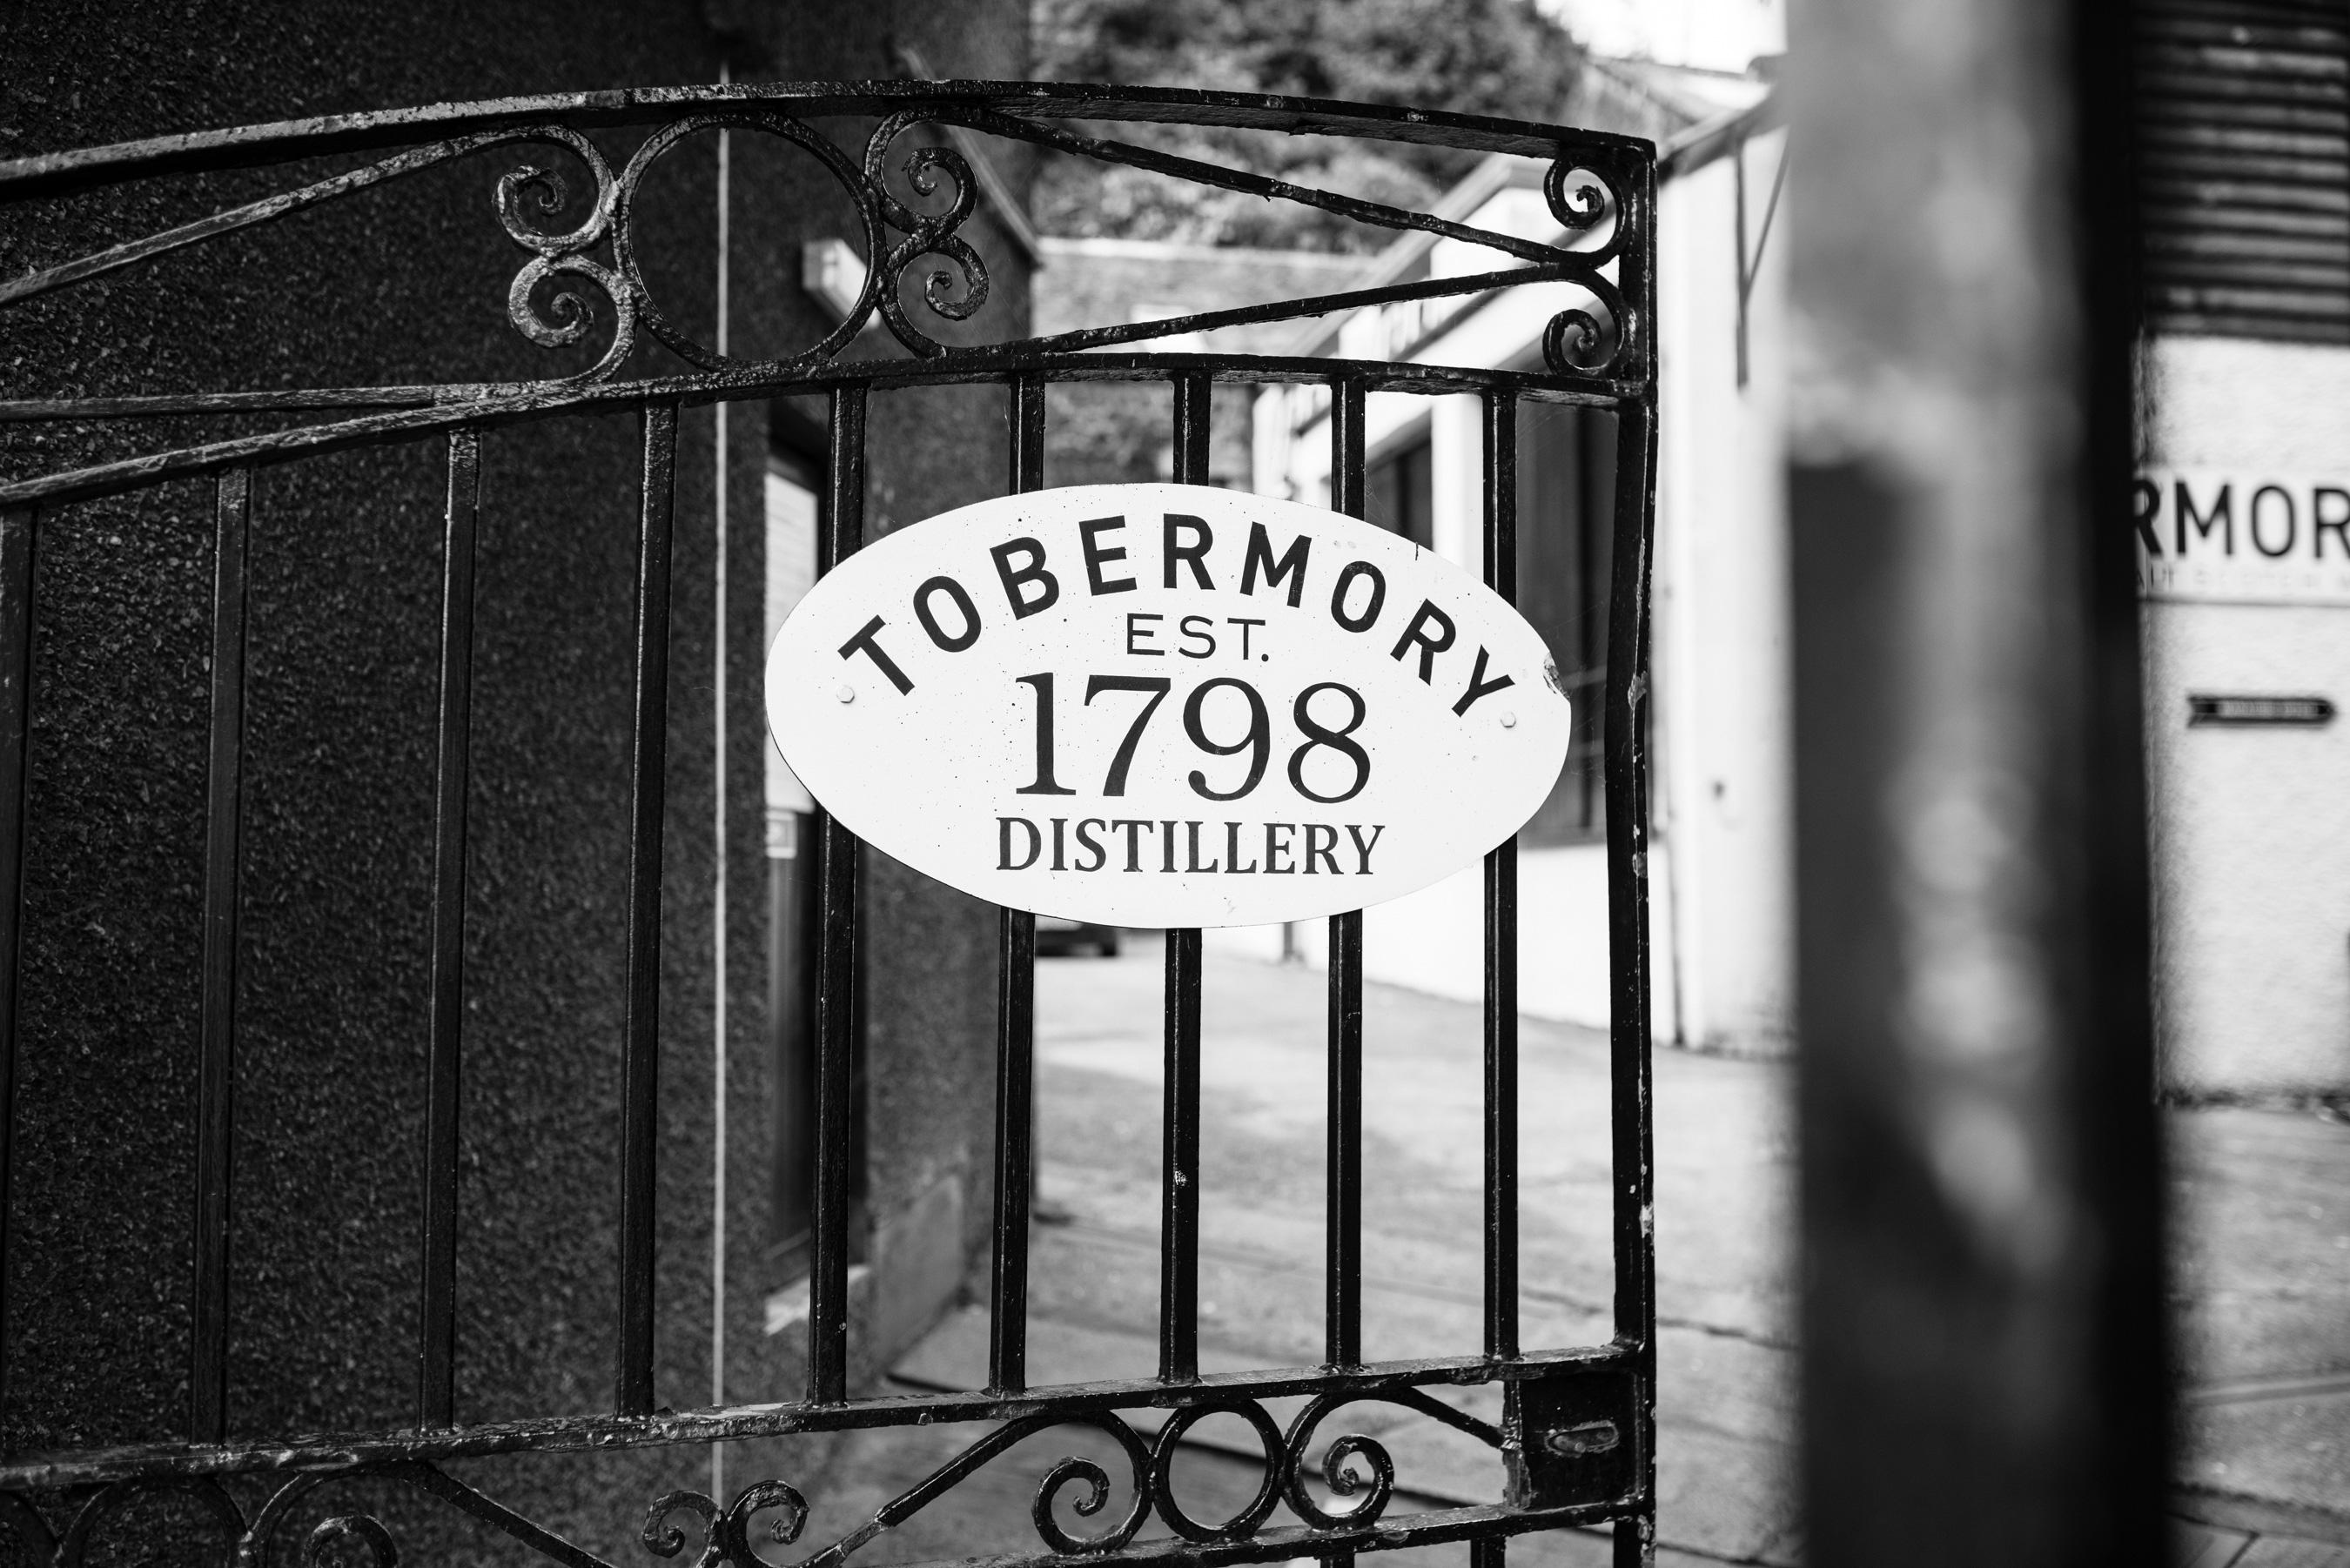 matt-stansfield-whiskey-tobermory-distillery-5597